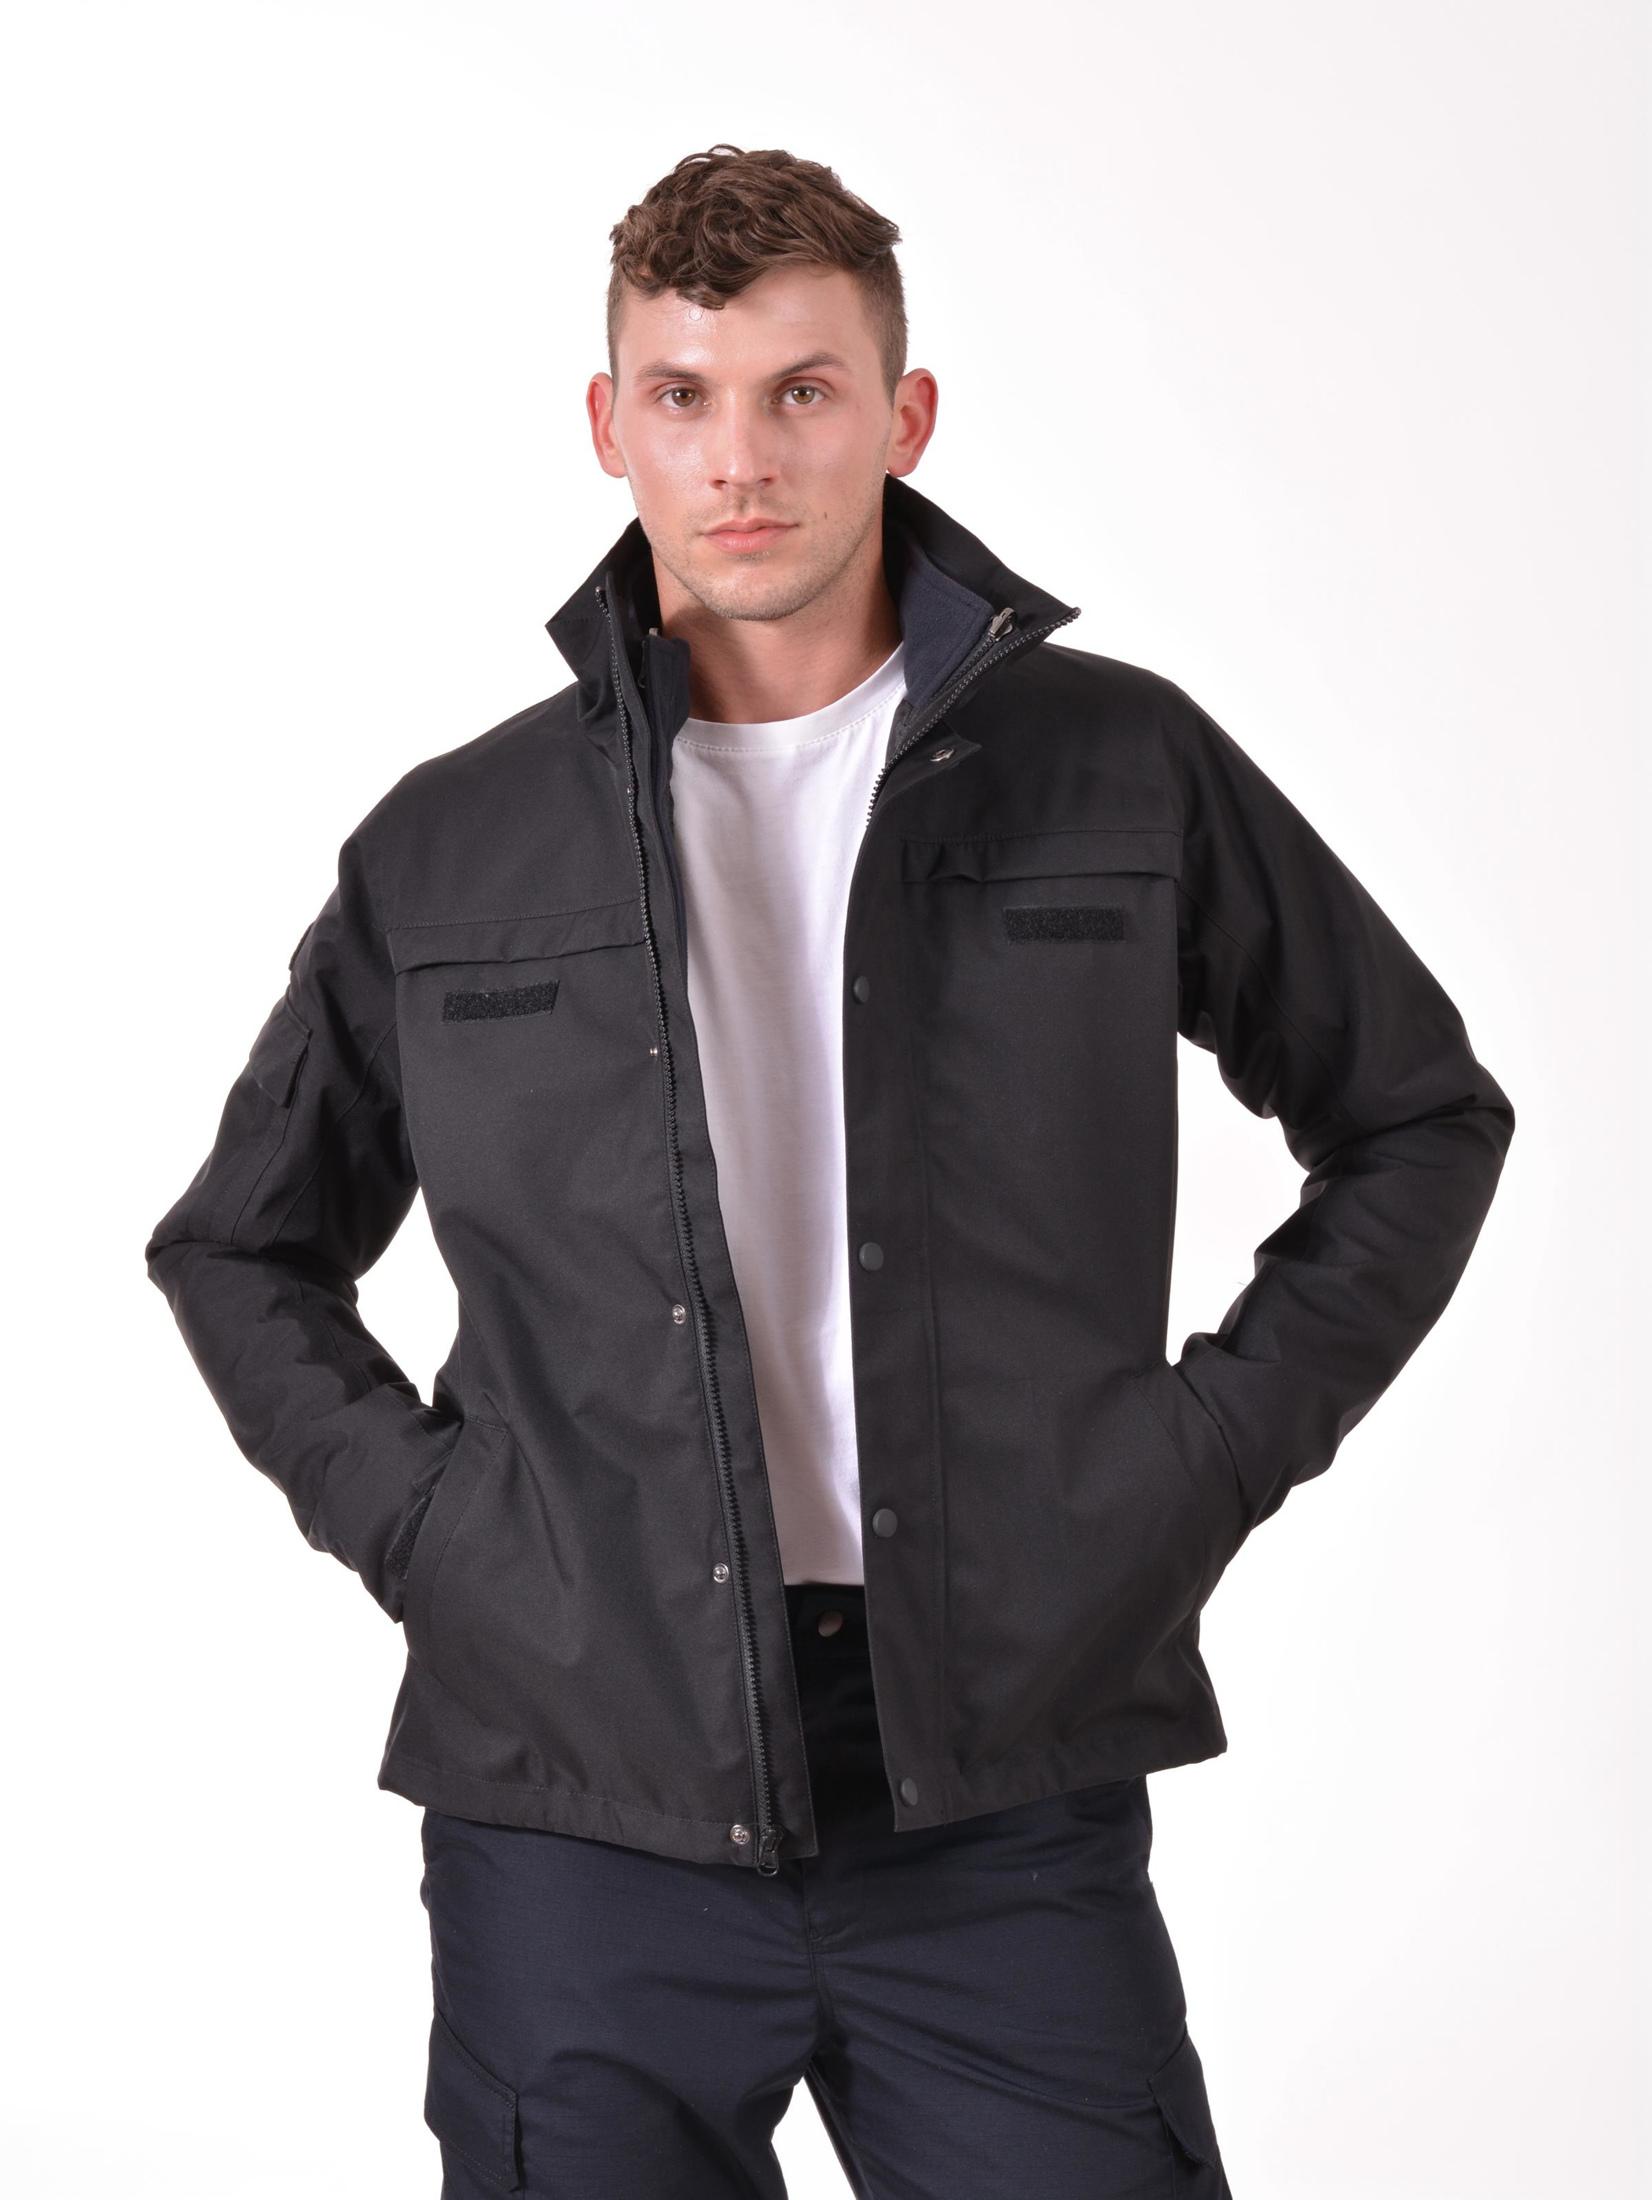 men's jacket 3u1, hardshell, underjacket dettachable, muška jakna 3u1, hardshell, podjakna